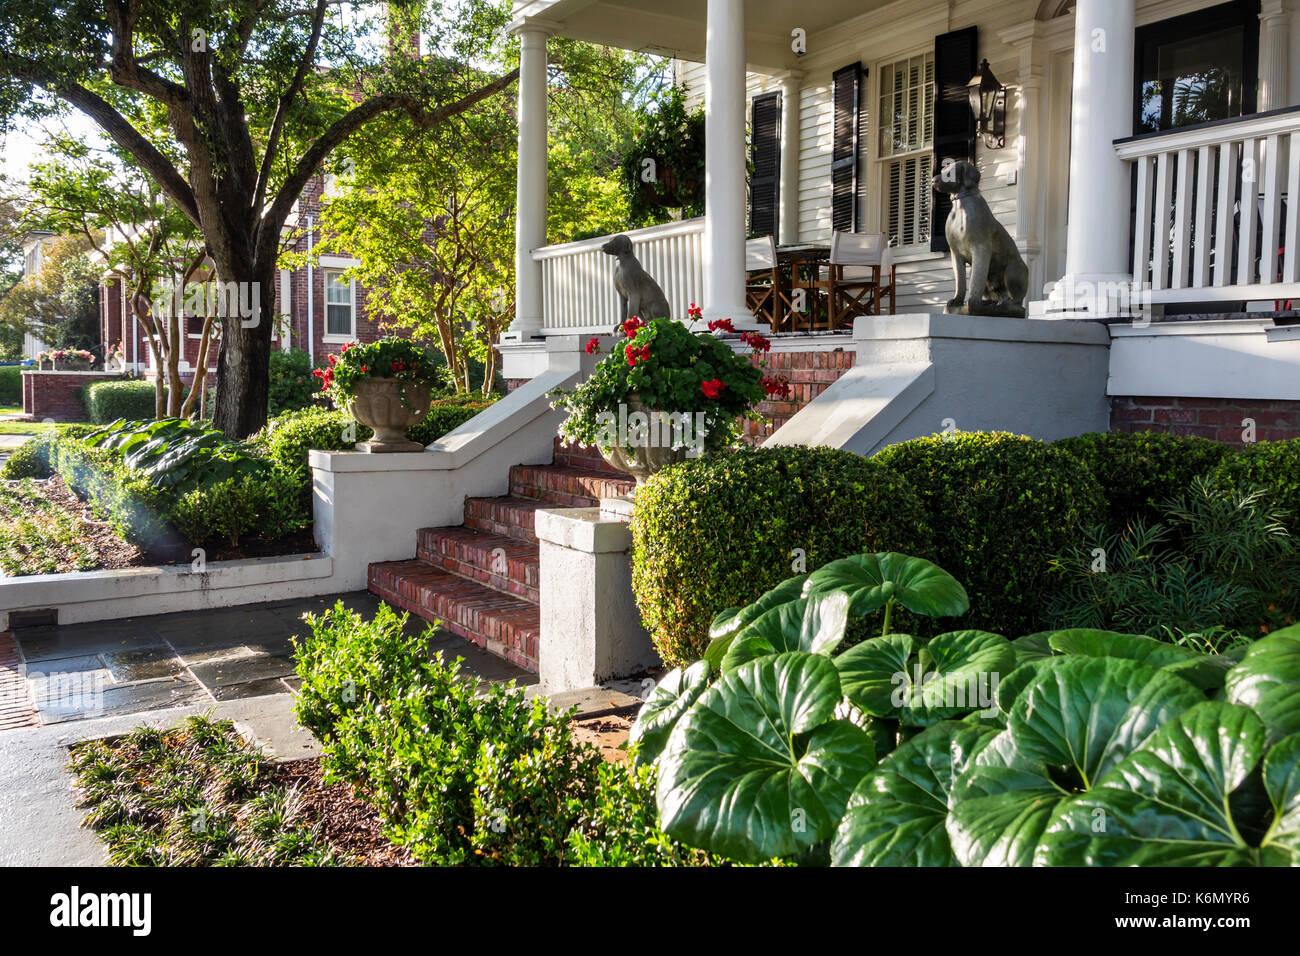 Charleston South Carolina SC South of Broad neighborhood home garden landscaping entrance historic residences homes - Stock Image